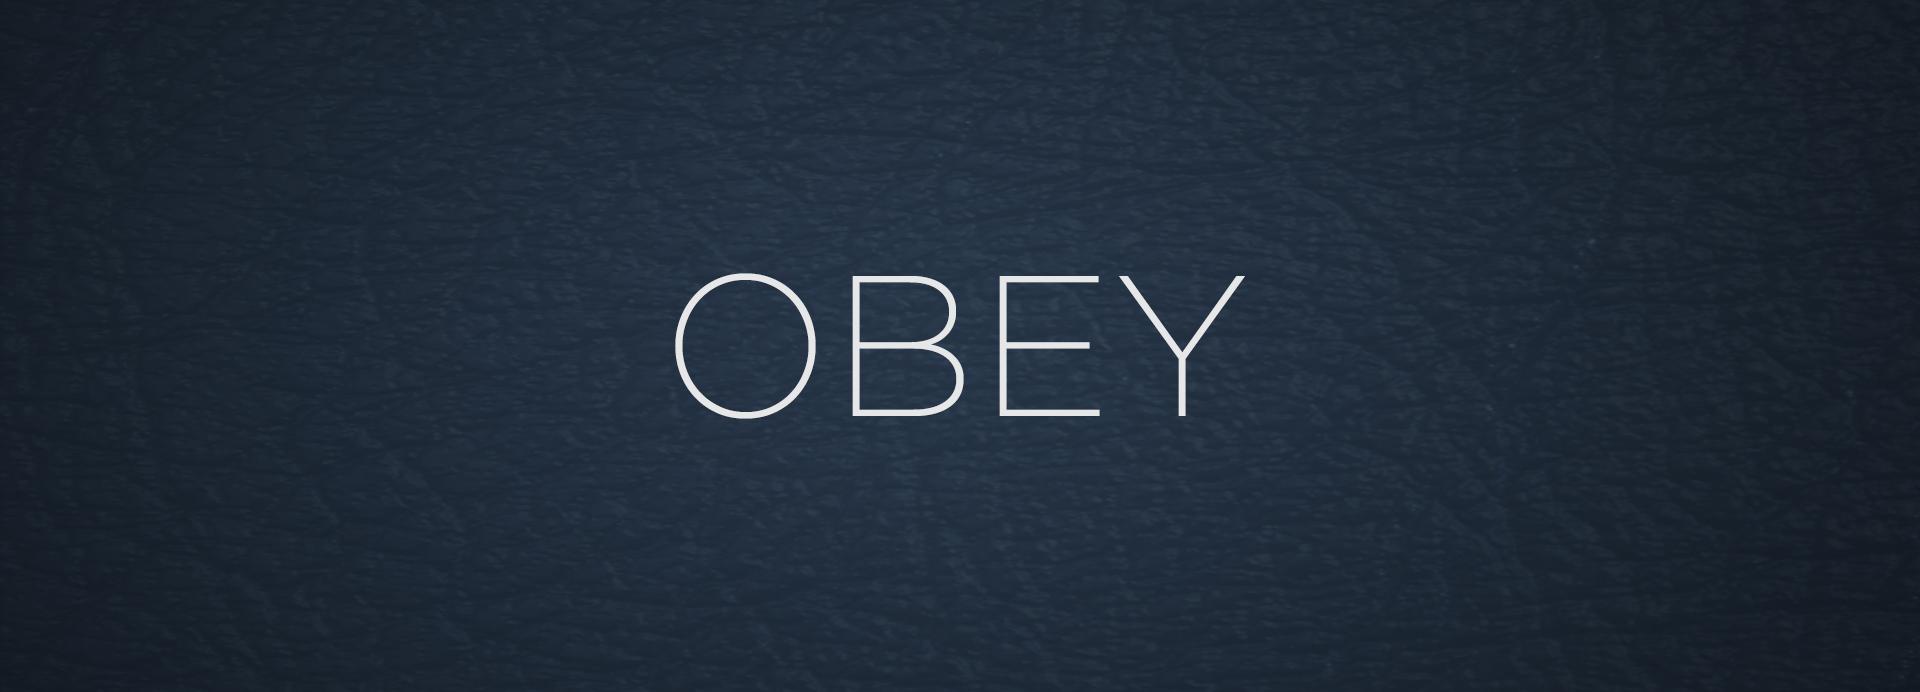 obey1920x692.jpg